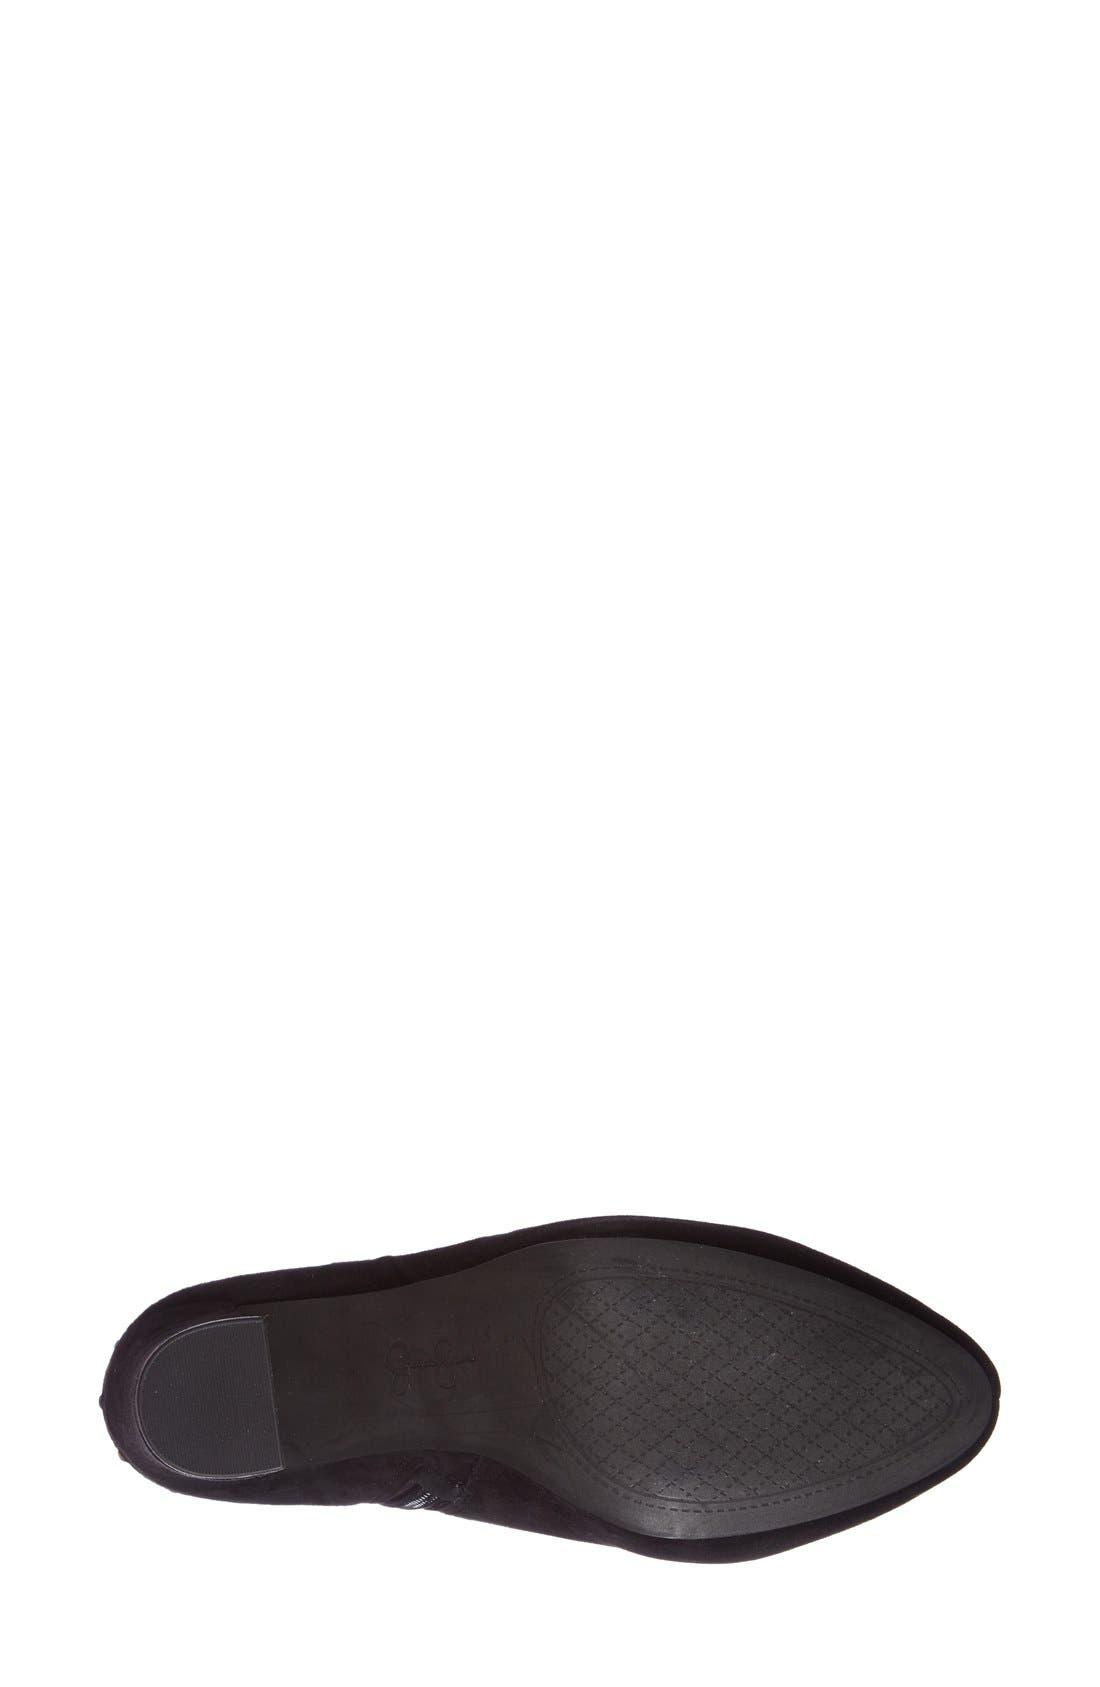 Alternate Image 4  - Jessica Simpson 'Marguerit' Tassel Bootie (Women)